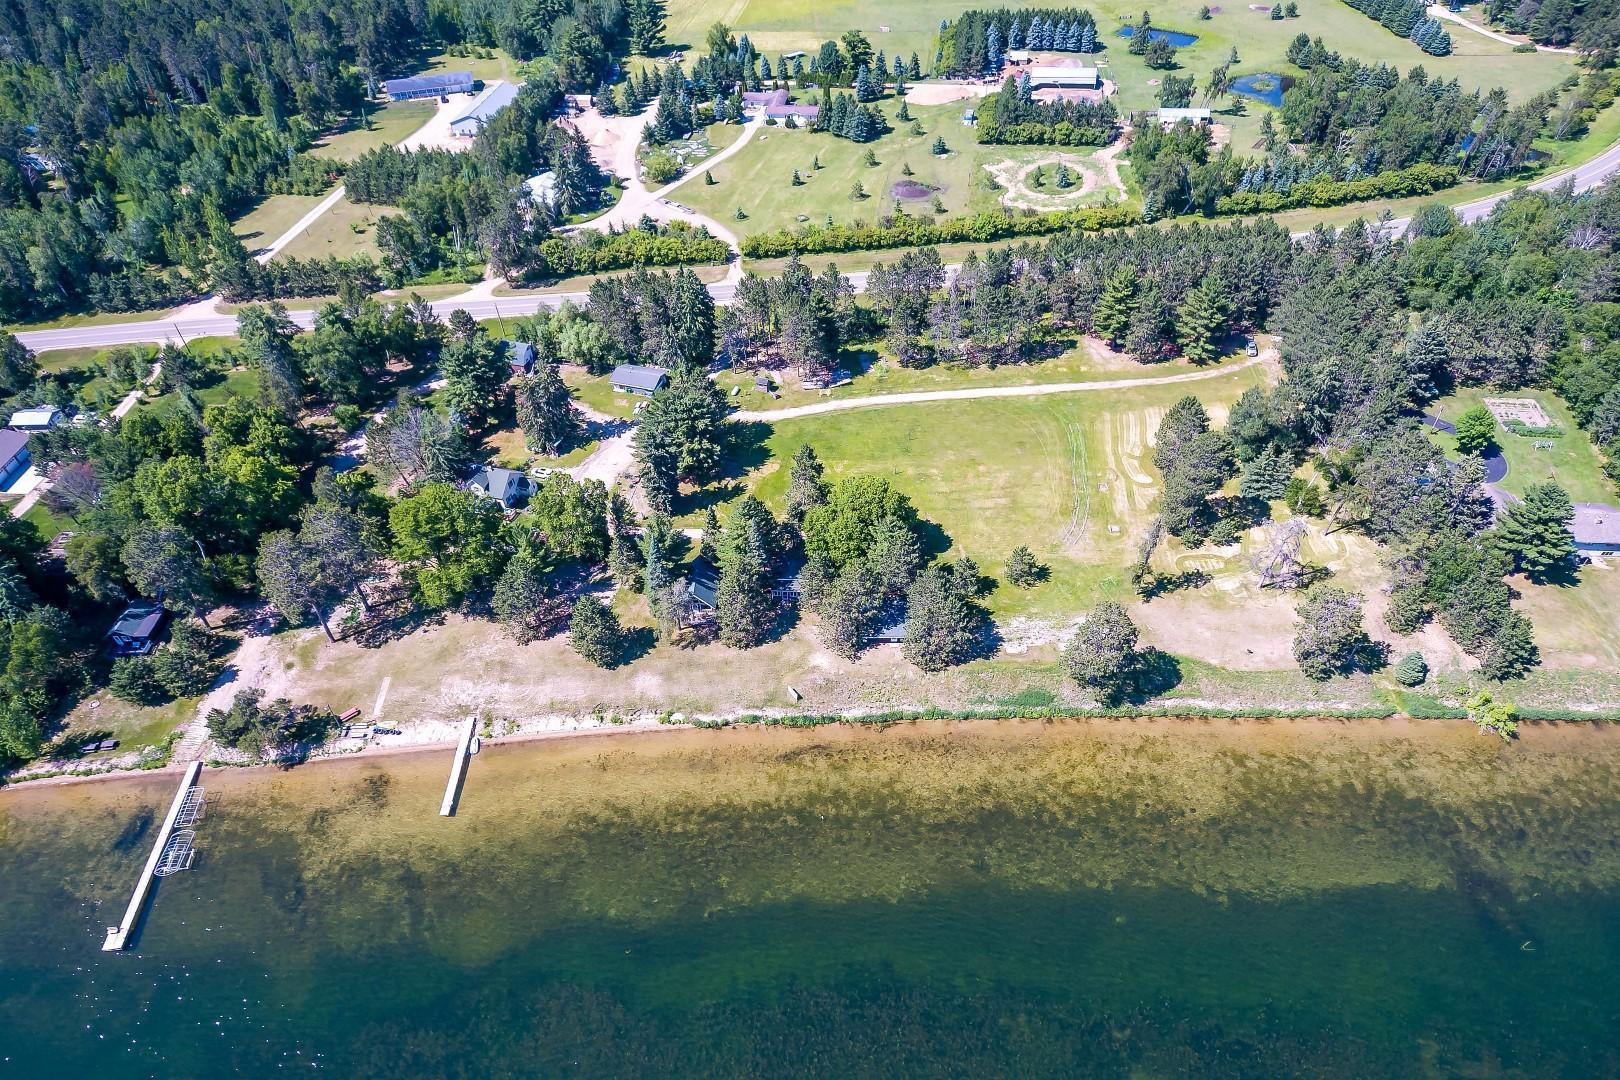 Tbd Lot 5 County 39 Property Photo